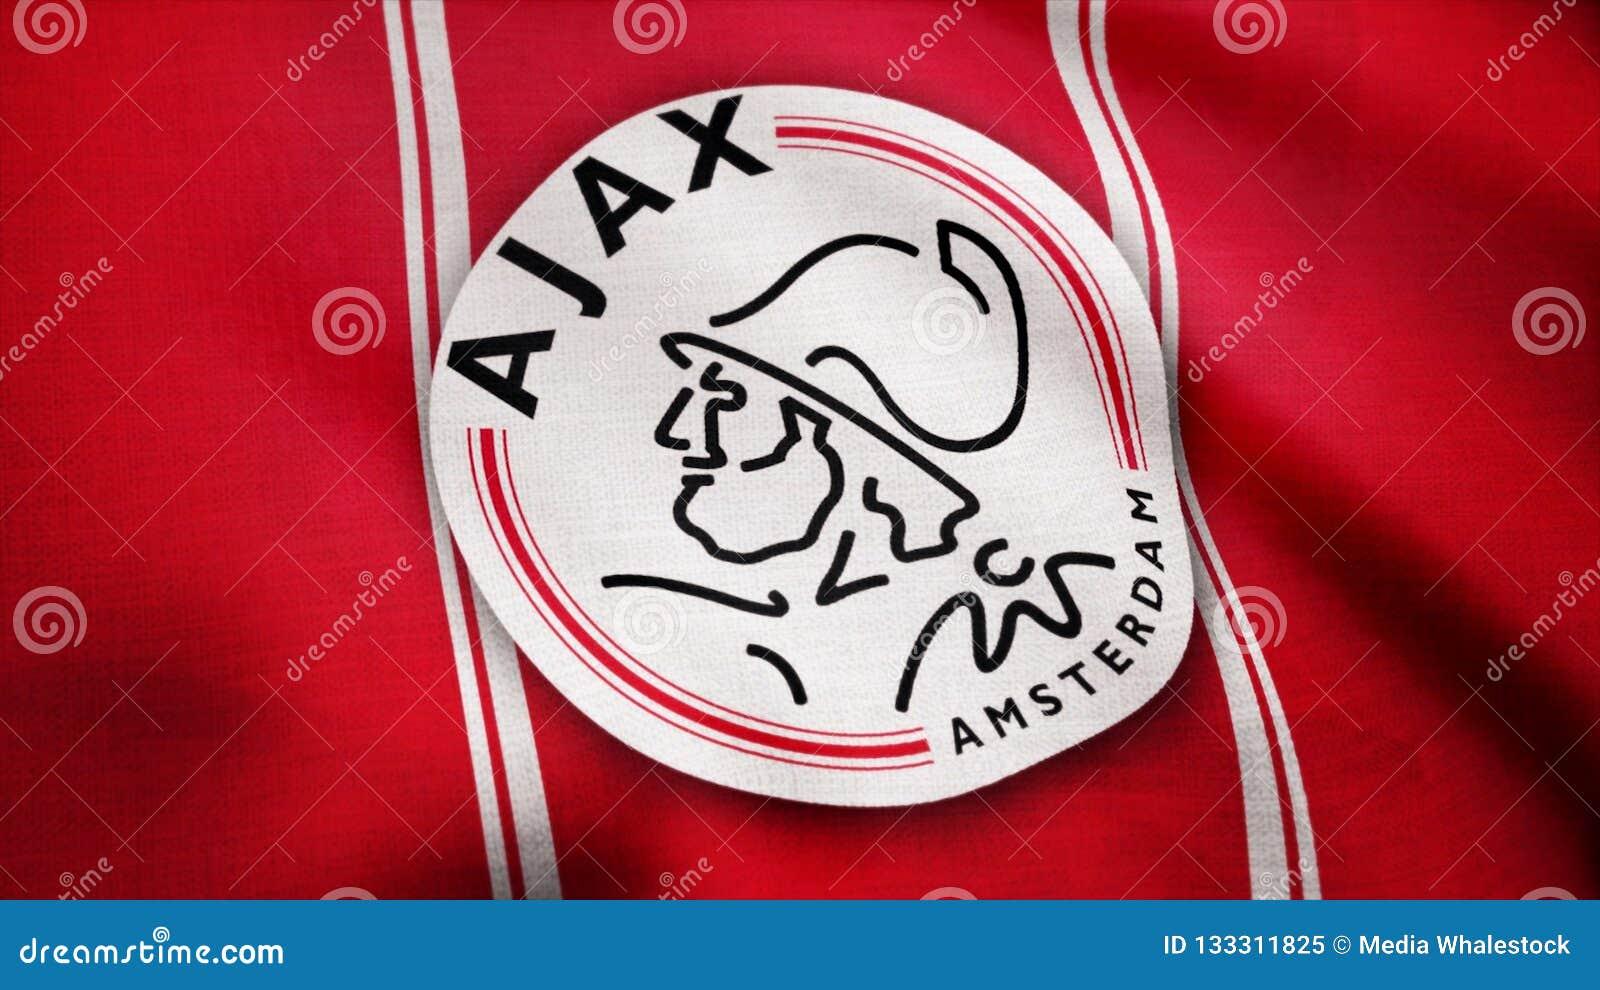 USA - NEW YORK, 12 August 2018: Ajax FC flag is waving. Close-up of waving flag with AFC Ajax football club logo